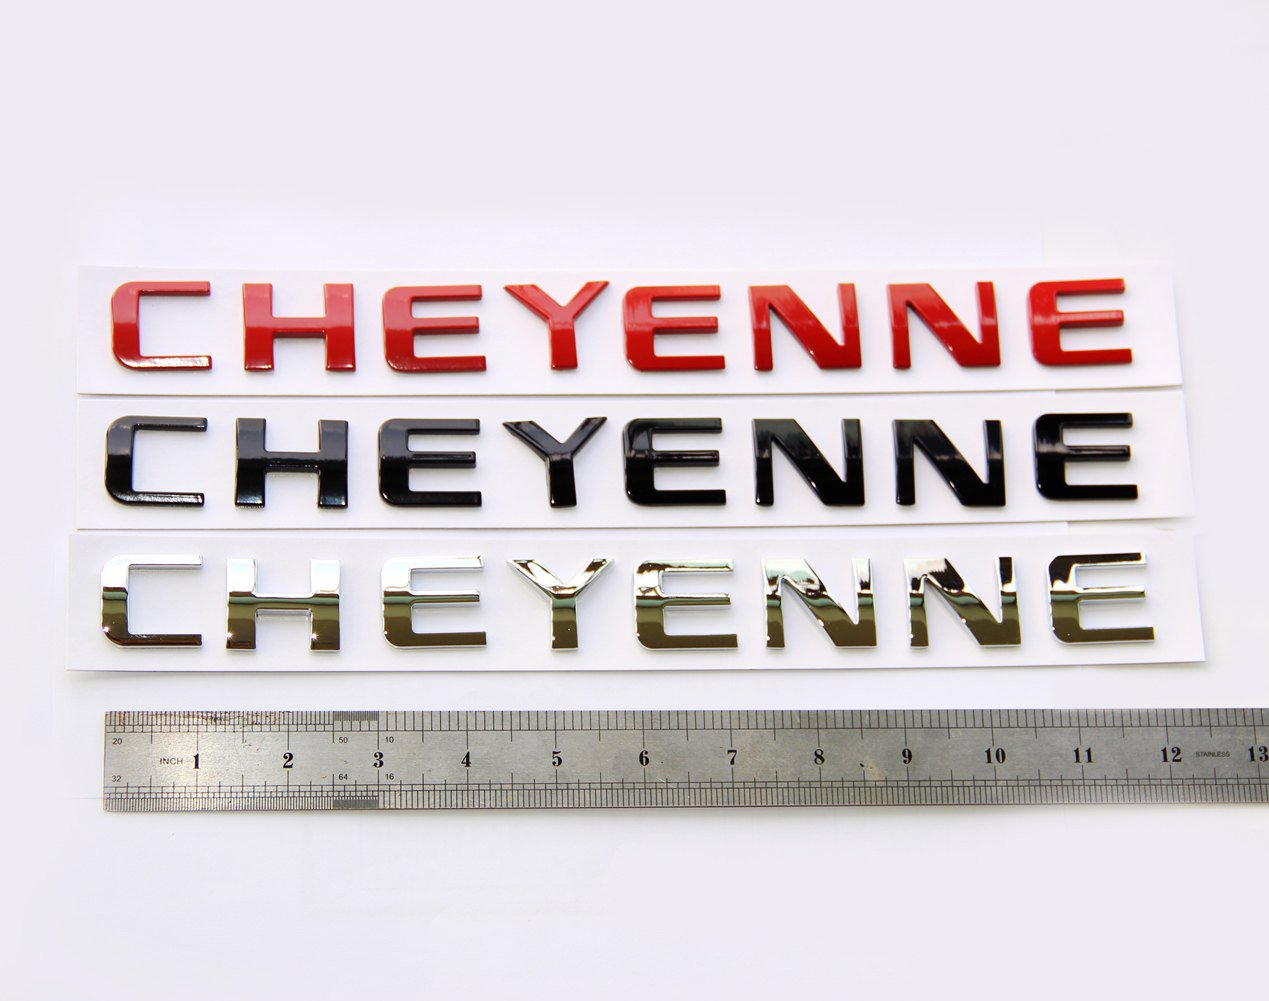 Yoaoo 2x OEM Black CHEYENNE Nameplate Emblems Badge 3D for GM Chevrolet Silverado Shiny Glossy New